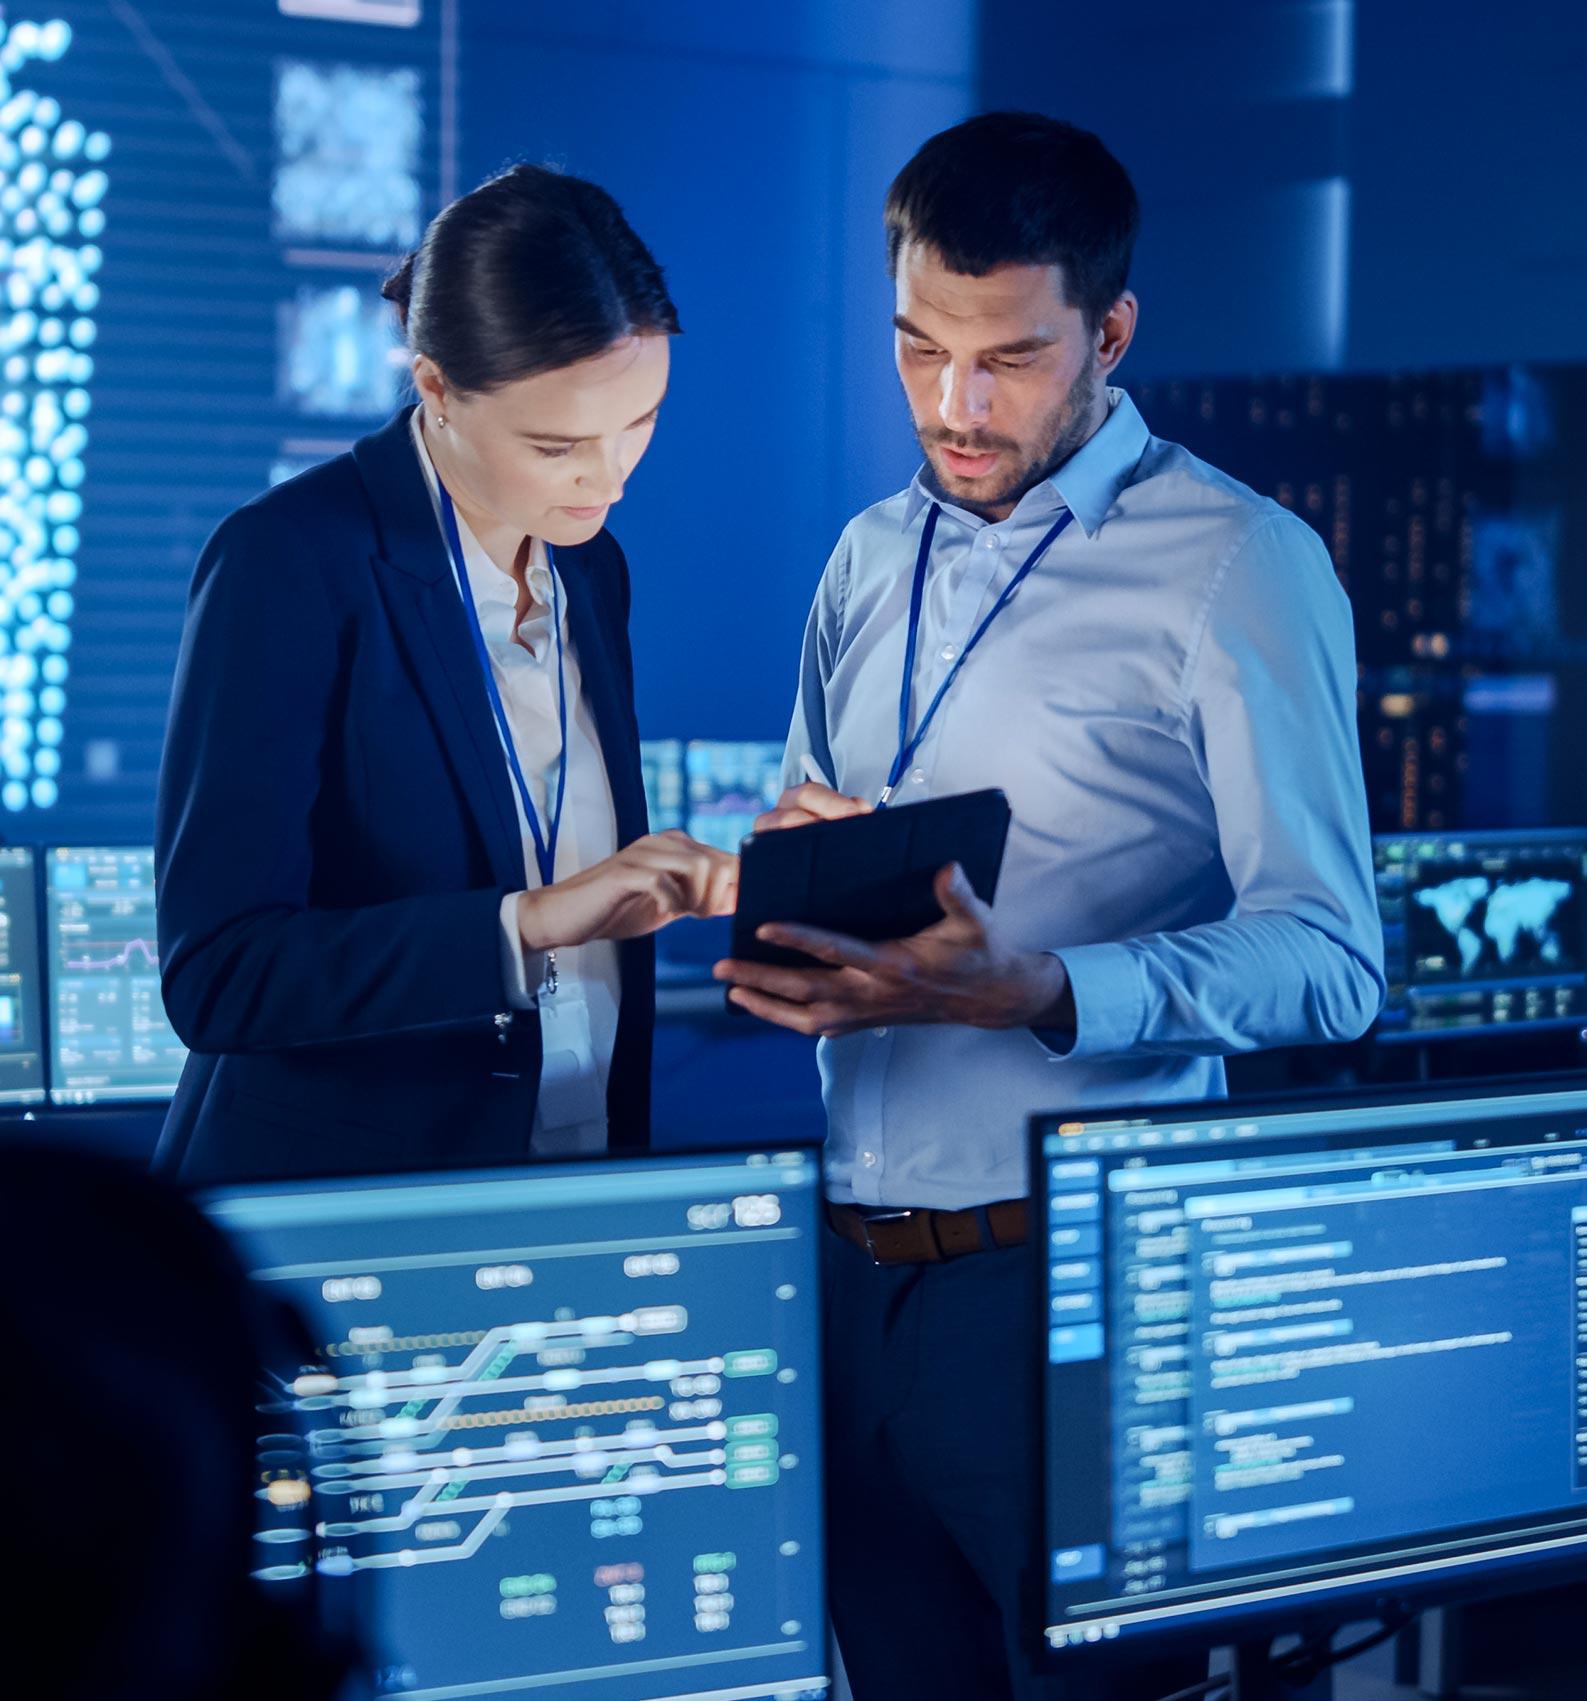 sistemi erp e software gestionali